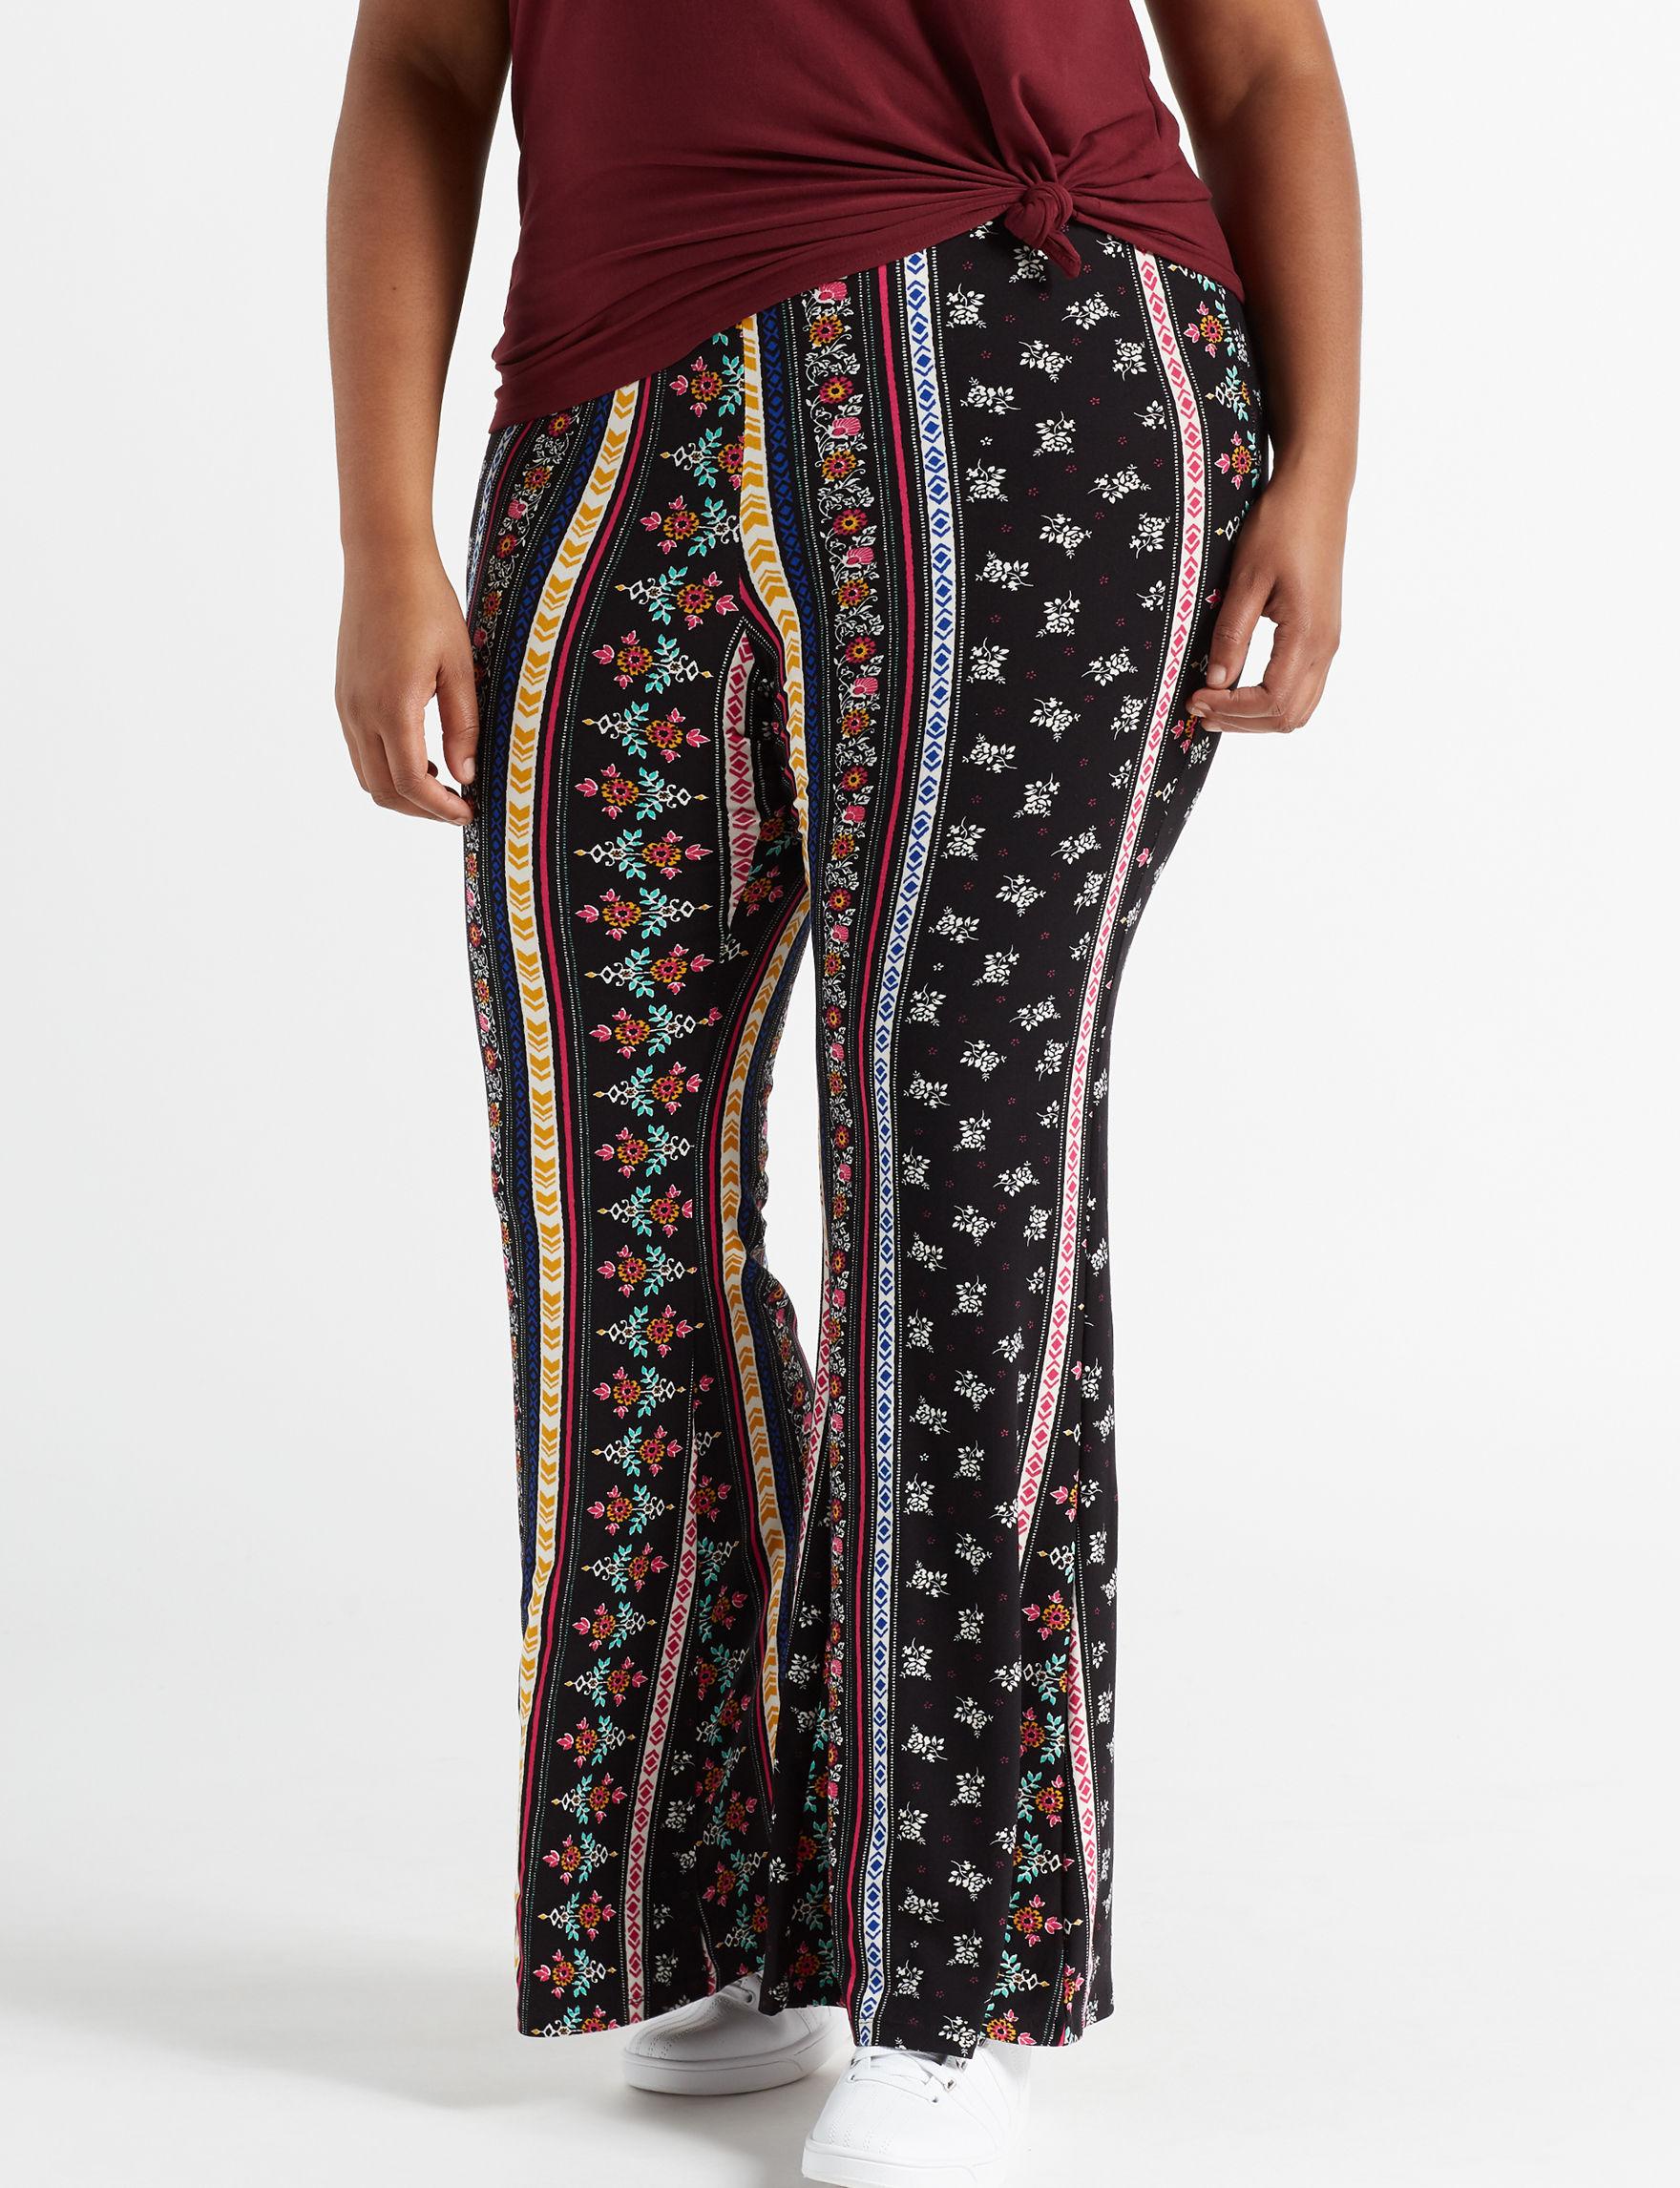 Eye Candy Black Multi Flare Soft Pants